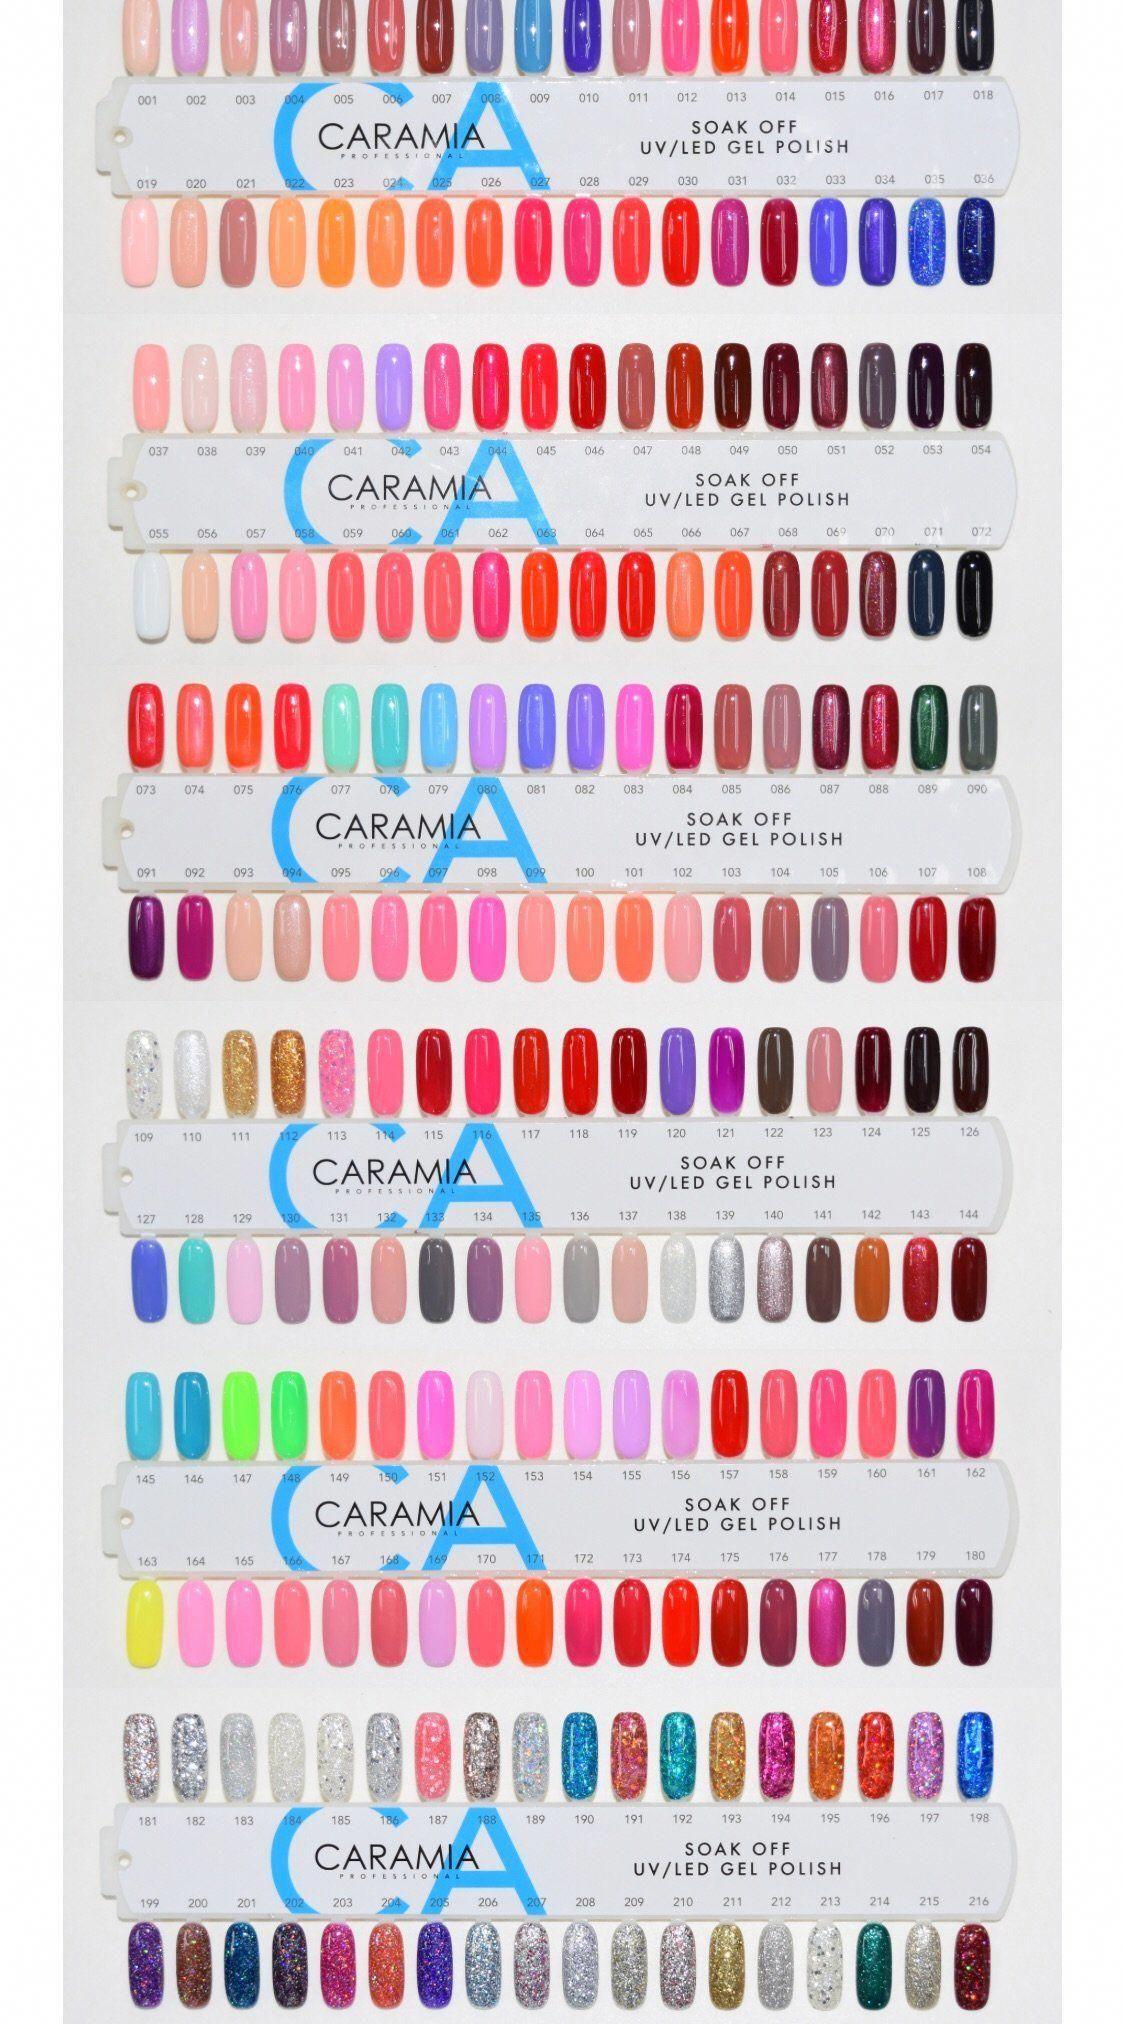 Caramia Complete Matching Set Gelnailpolish Nail Colors For Pale Skin Diy Nails Manicure Nail Polish Colors